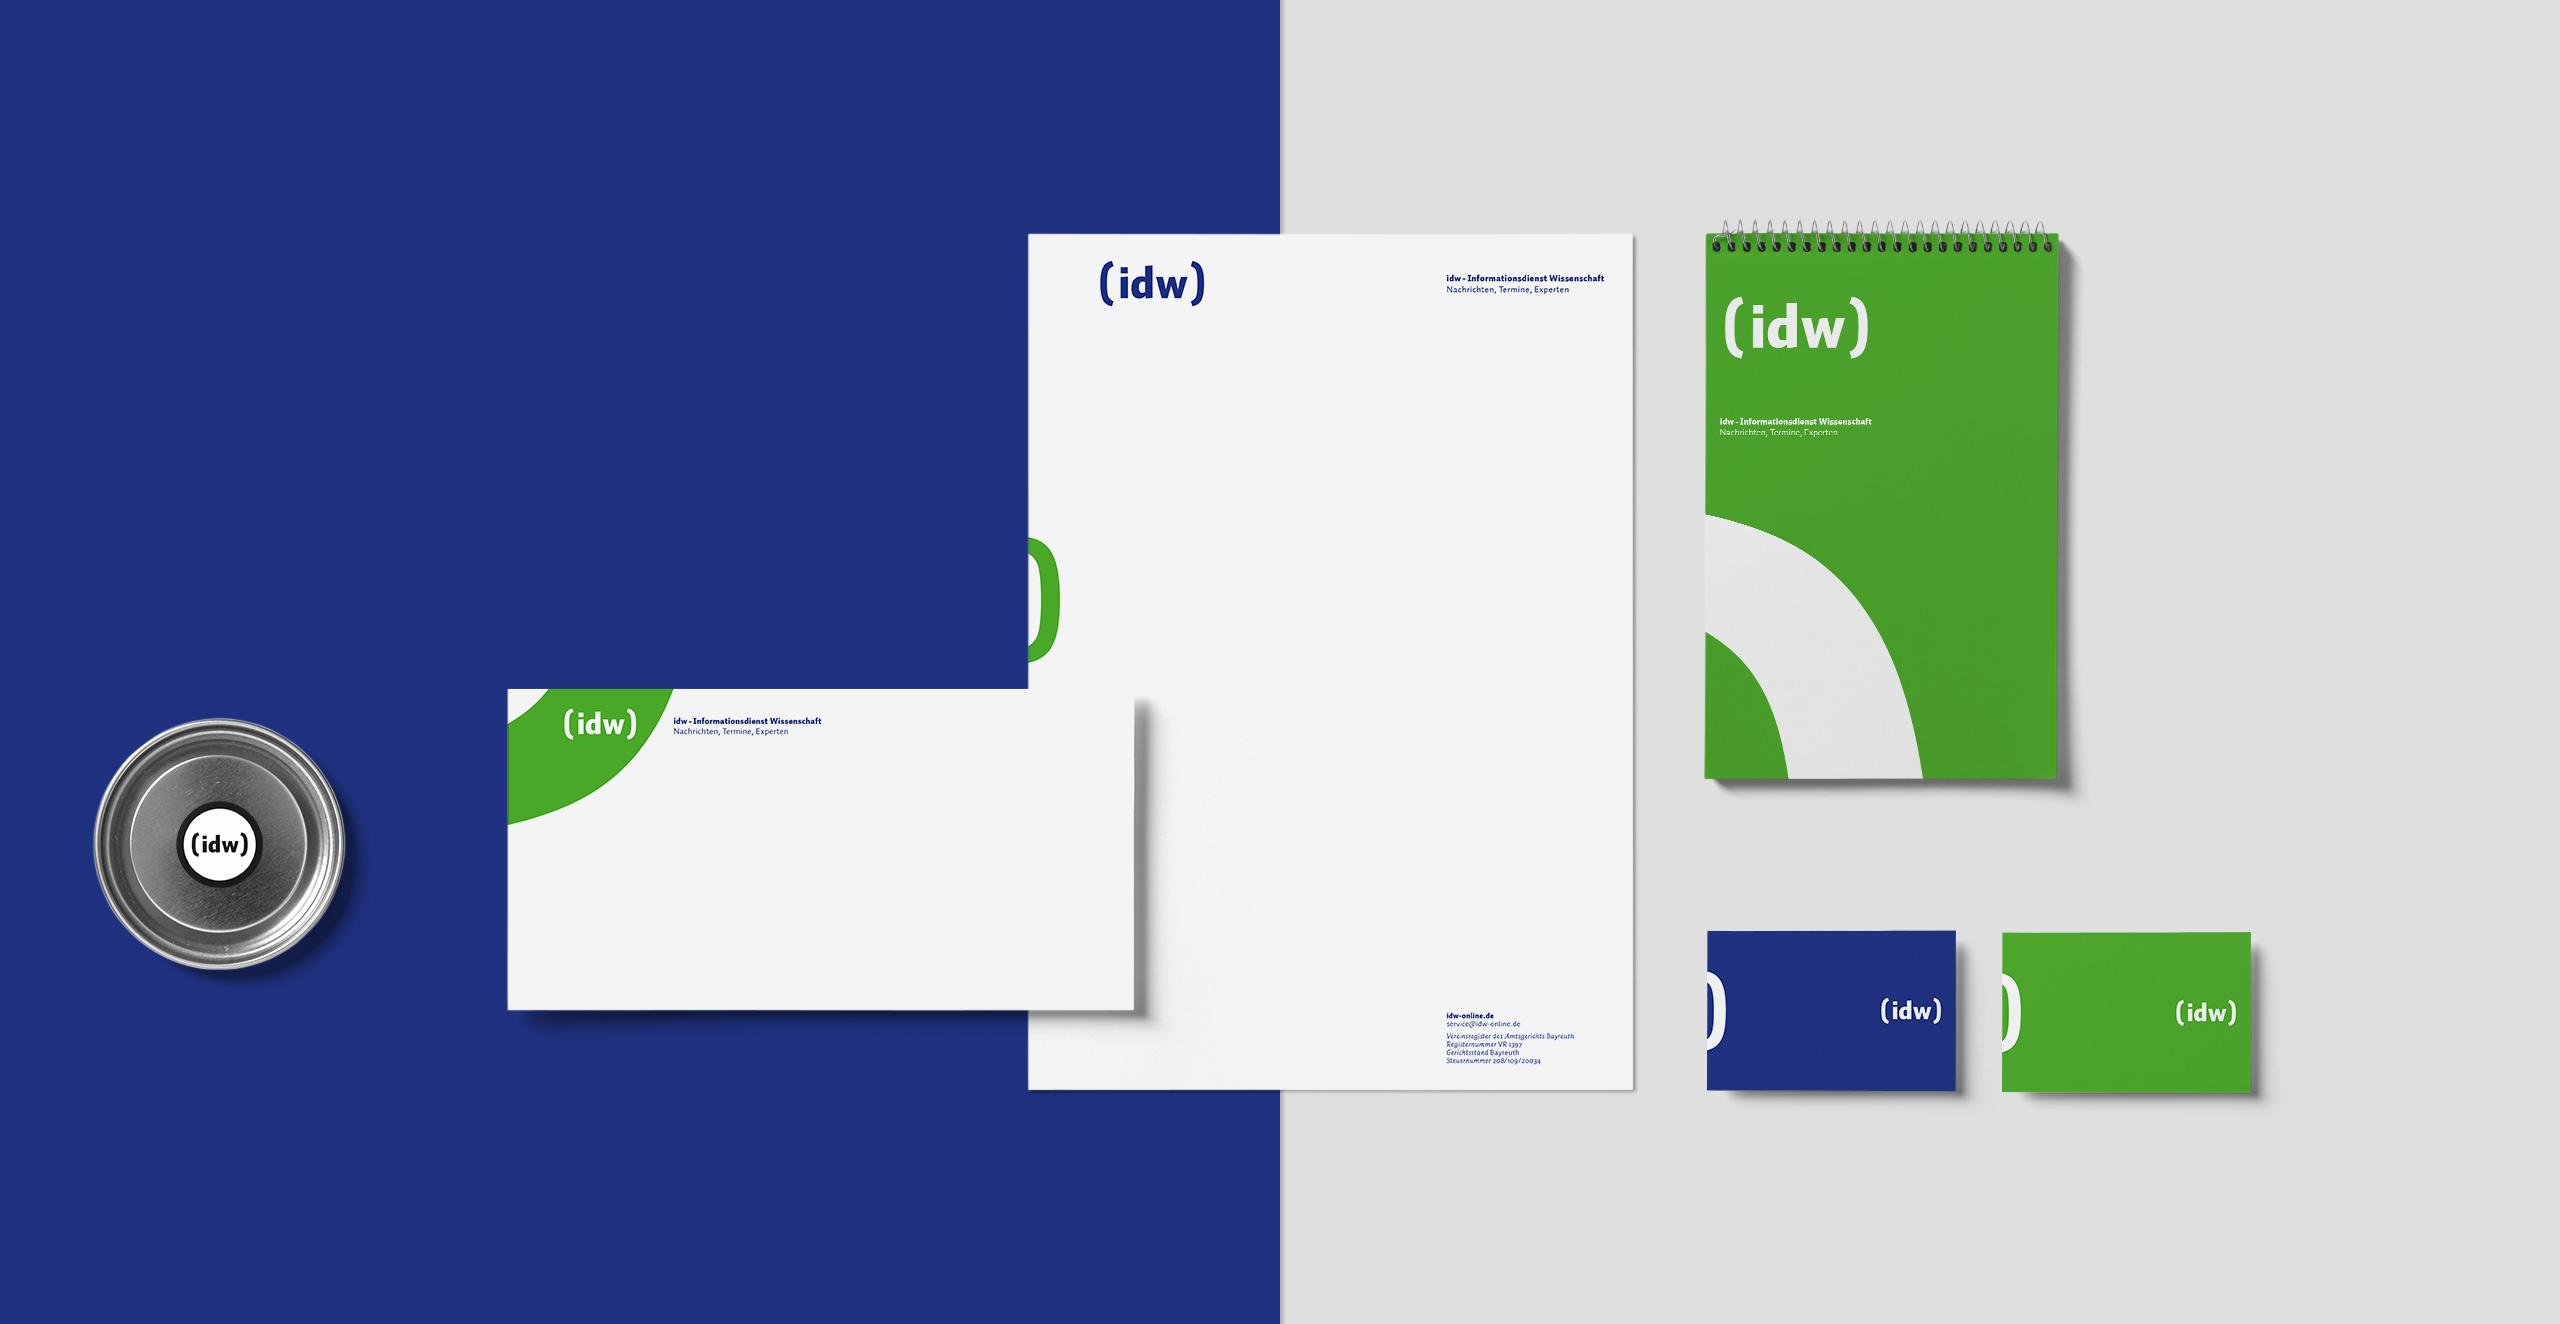 Informationsdienst_Wissenschaft-corporate_design